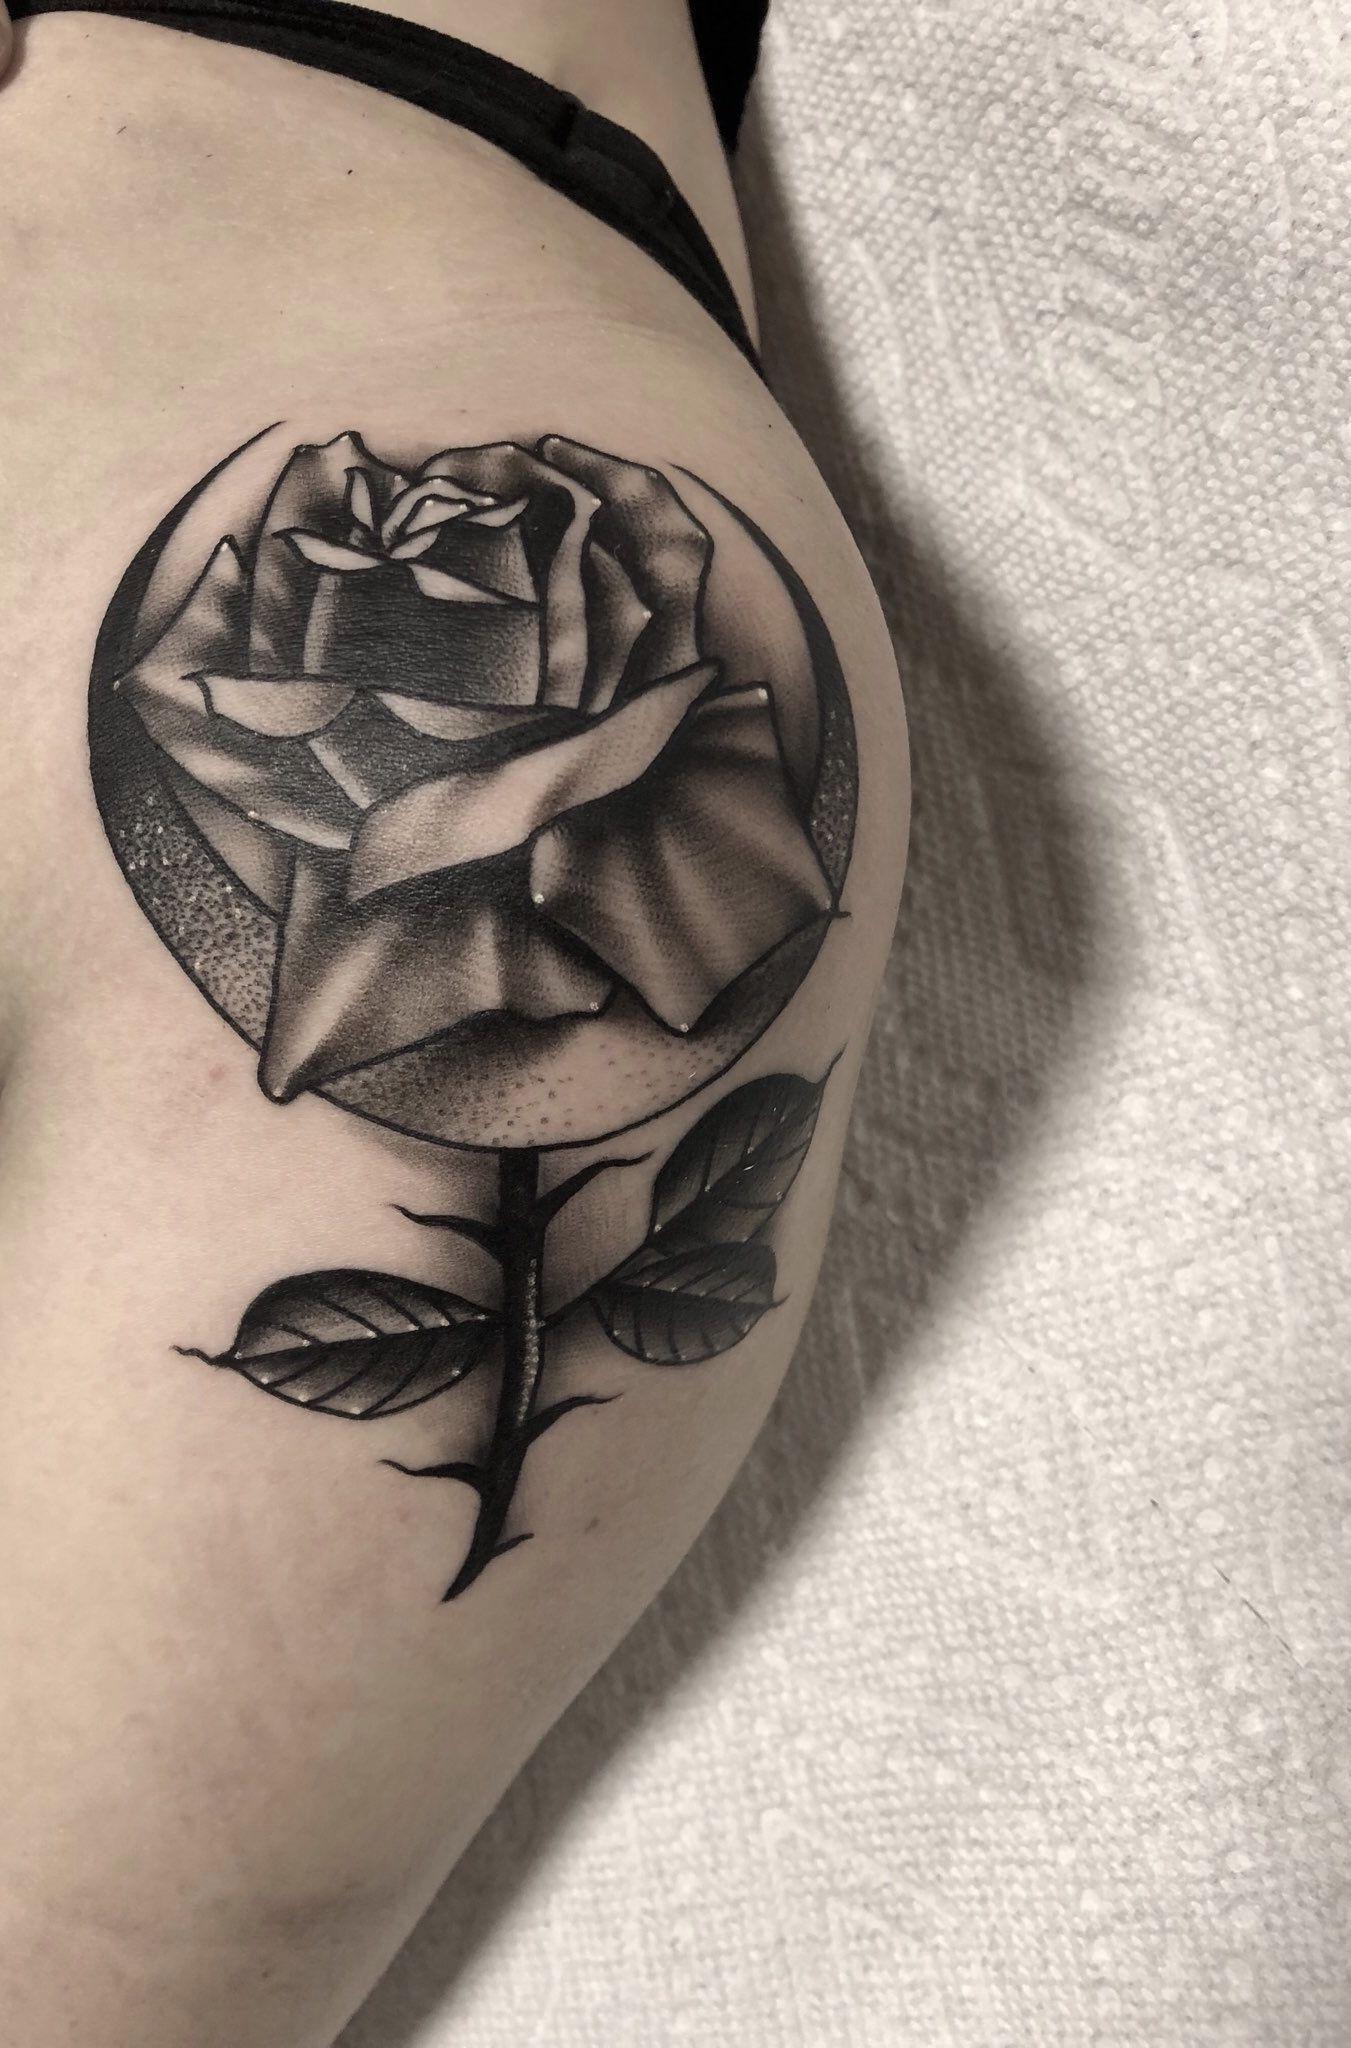 Rose Crescent Moon Venus Symbol Tattoo Looks Kind Of Feminist Tattoos Symbolic Tattoos Rose Tattoo